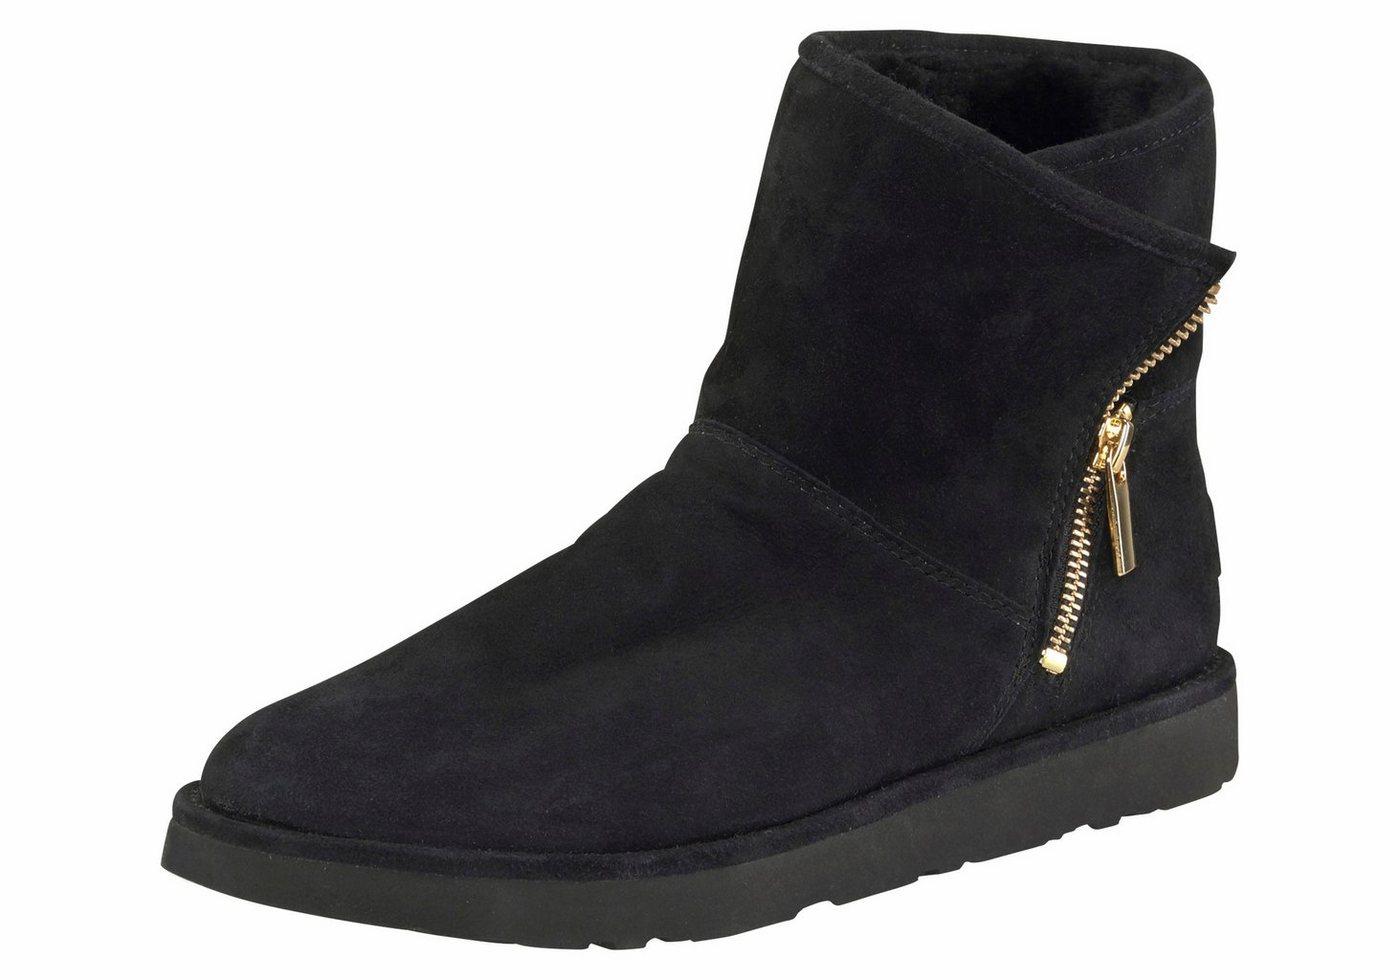 UGG »Kip« Winterboots mit trendy Reißverschluss am Schaft | Schuhe > Boots > Winterboots | Schwarz | UGG